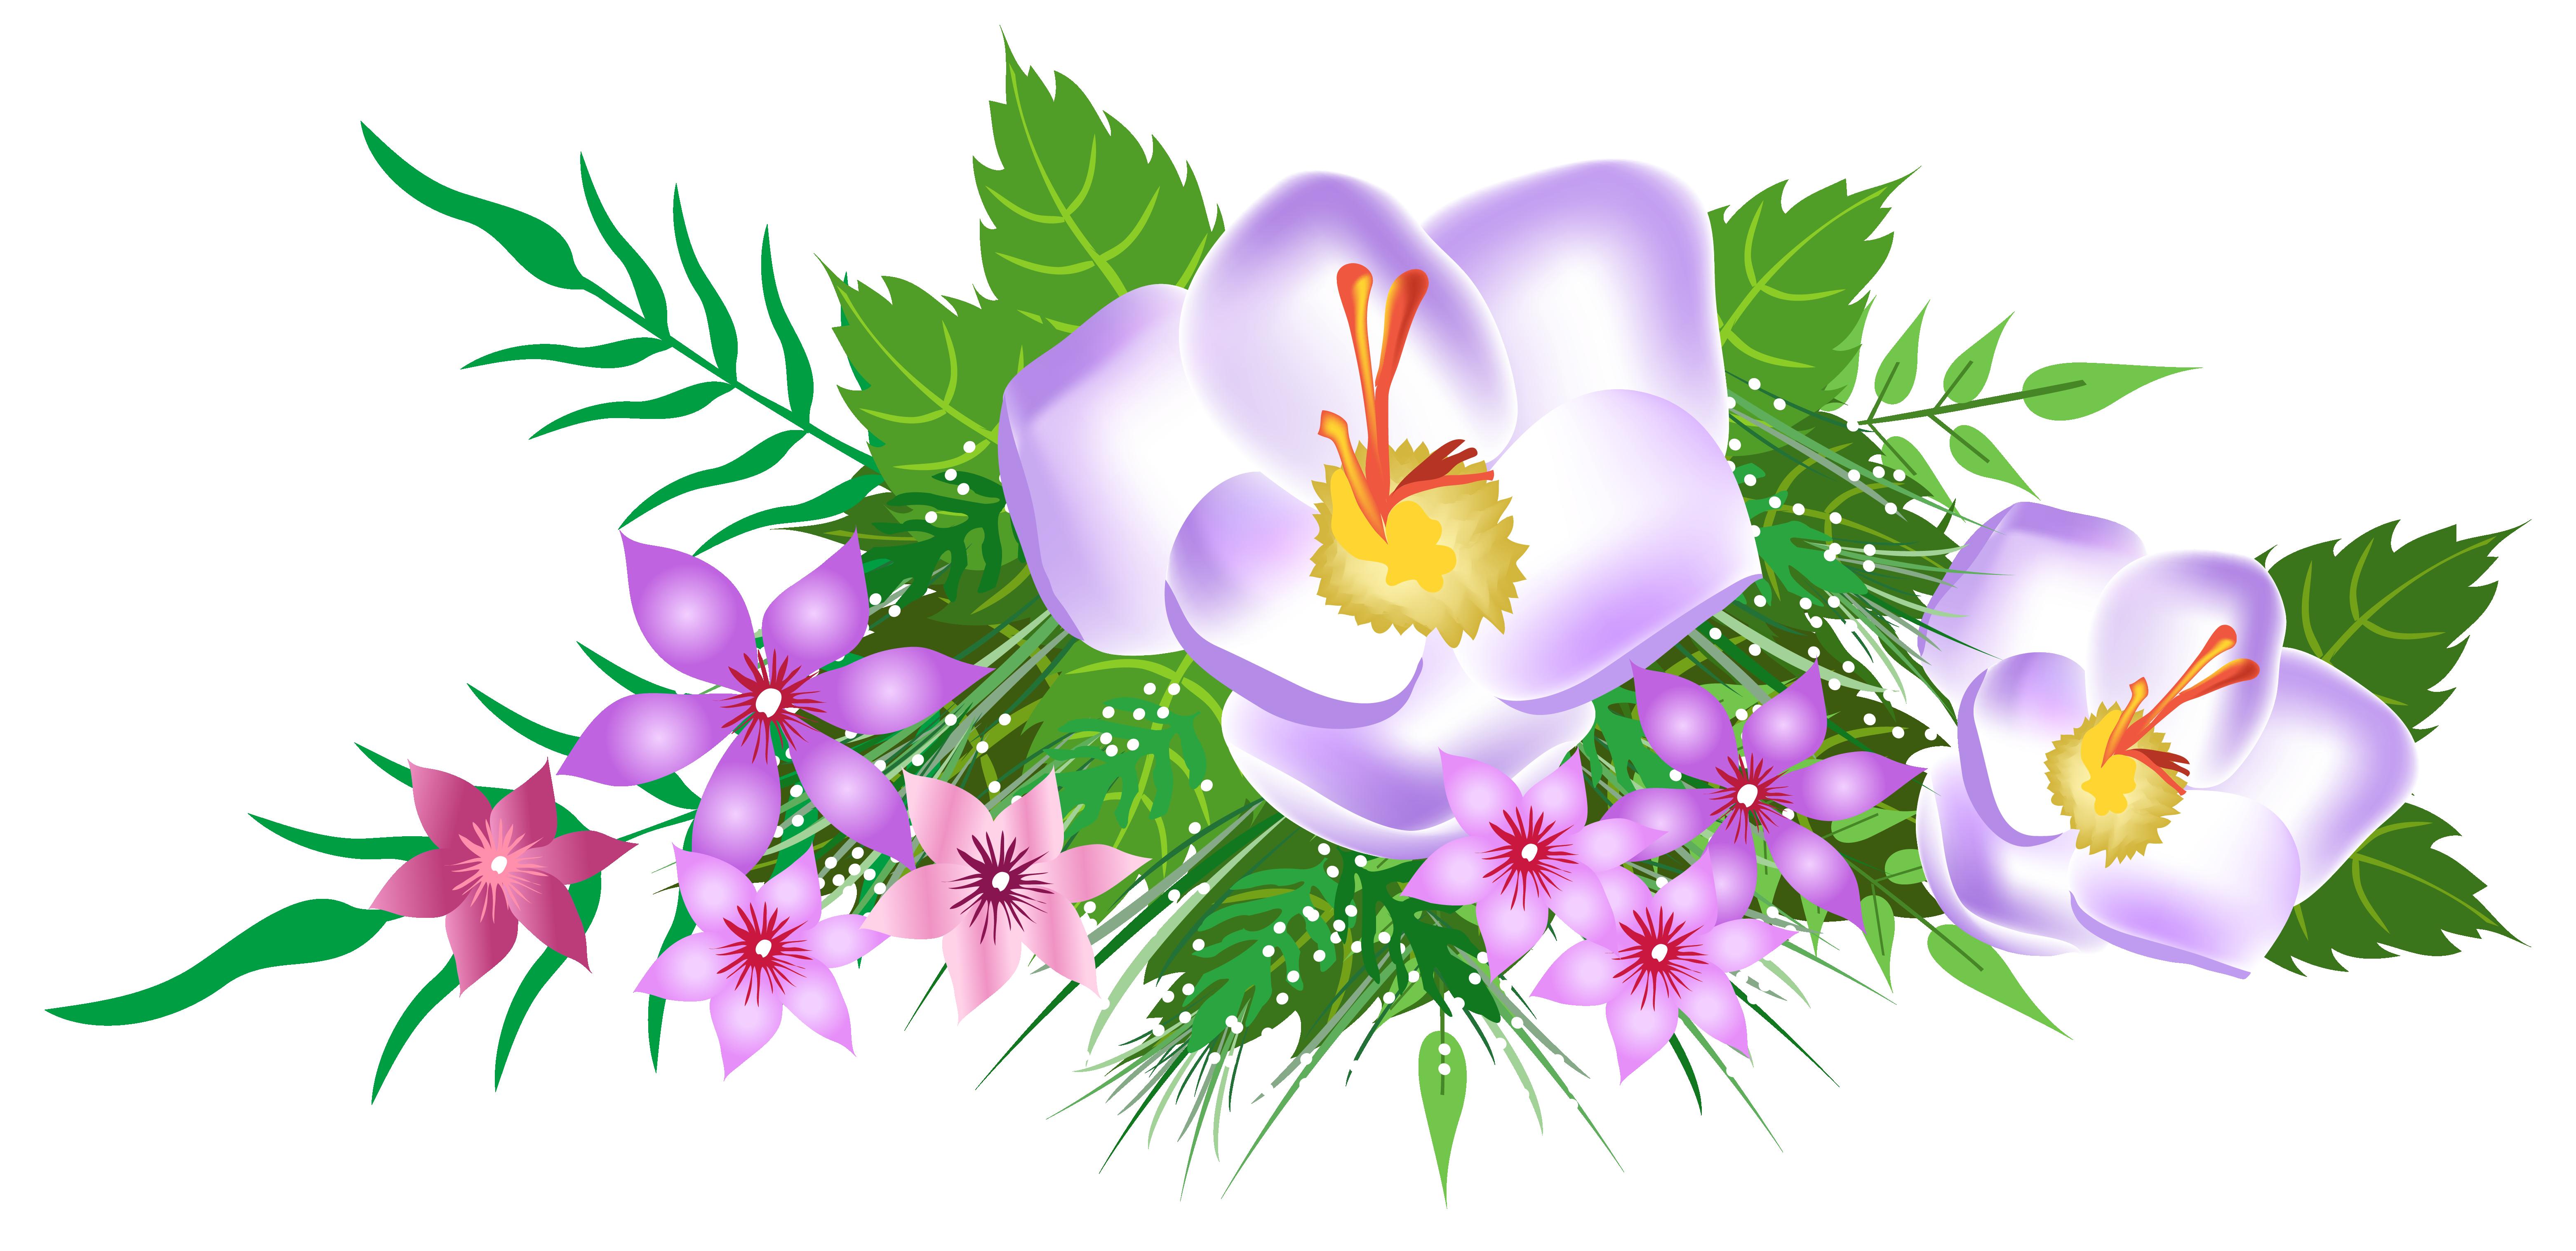 Flowers decorative png image. Clipart summer element